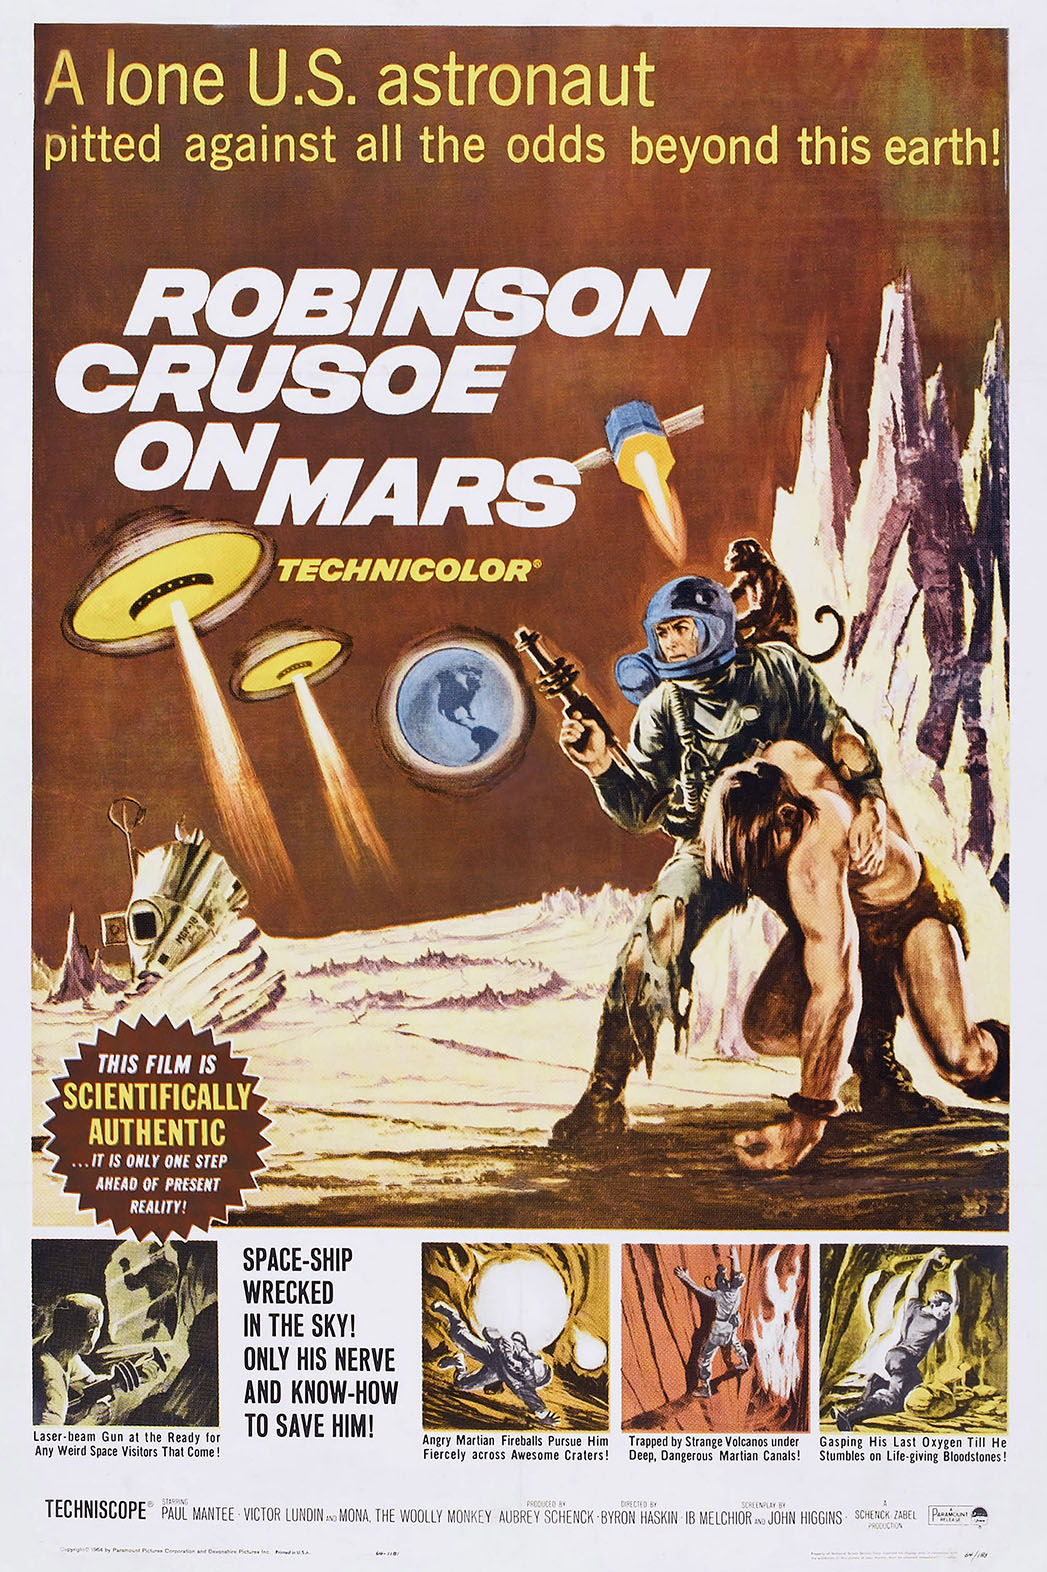 Robinson Crusoe on Mars Poster - P 2015